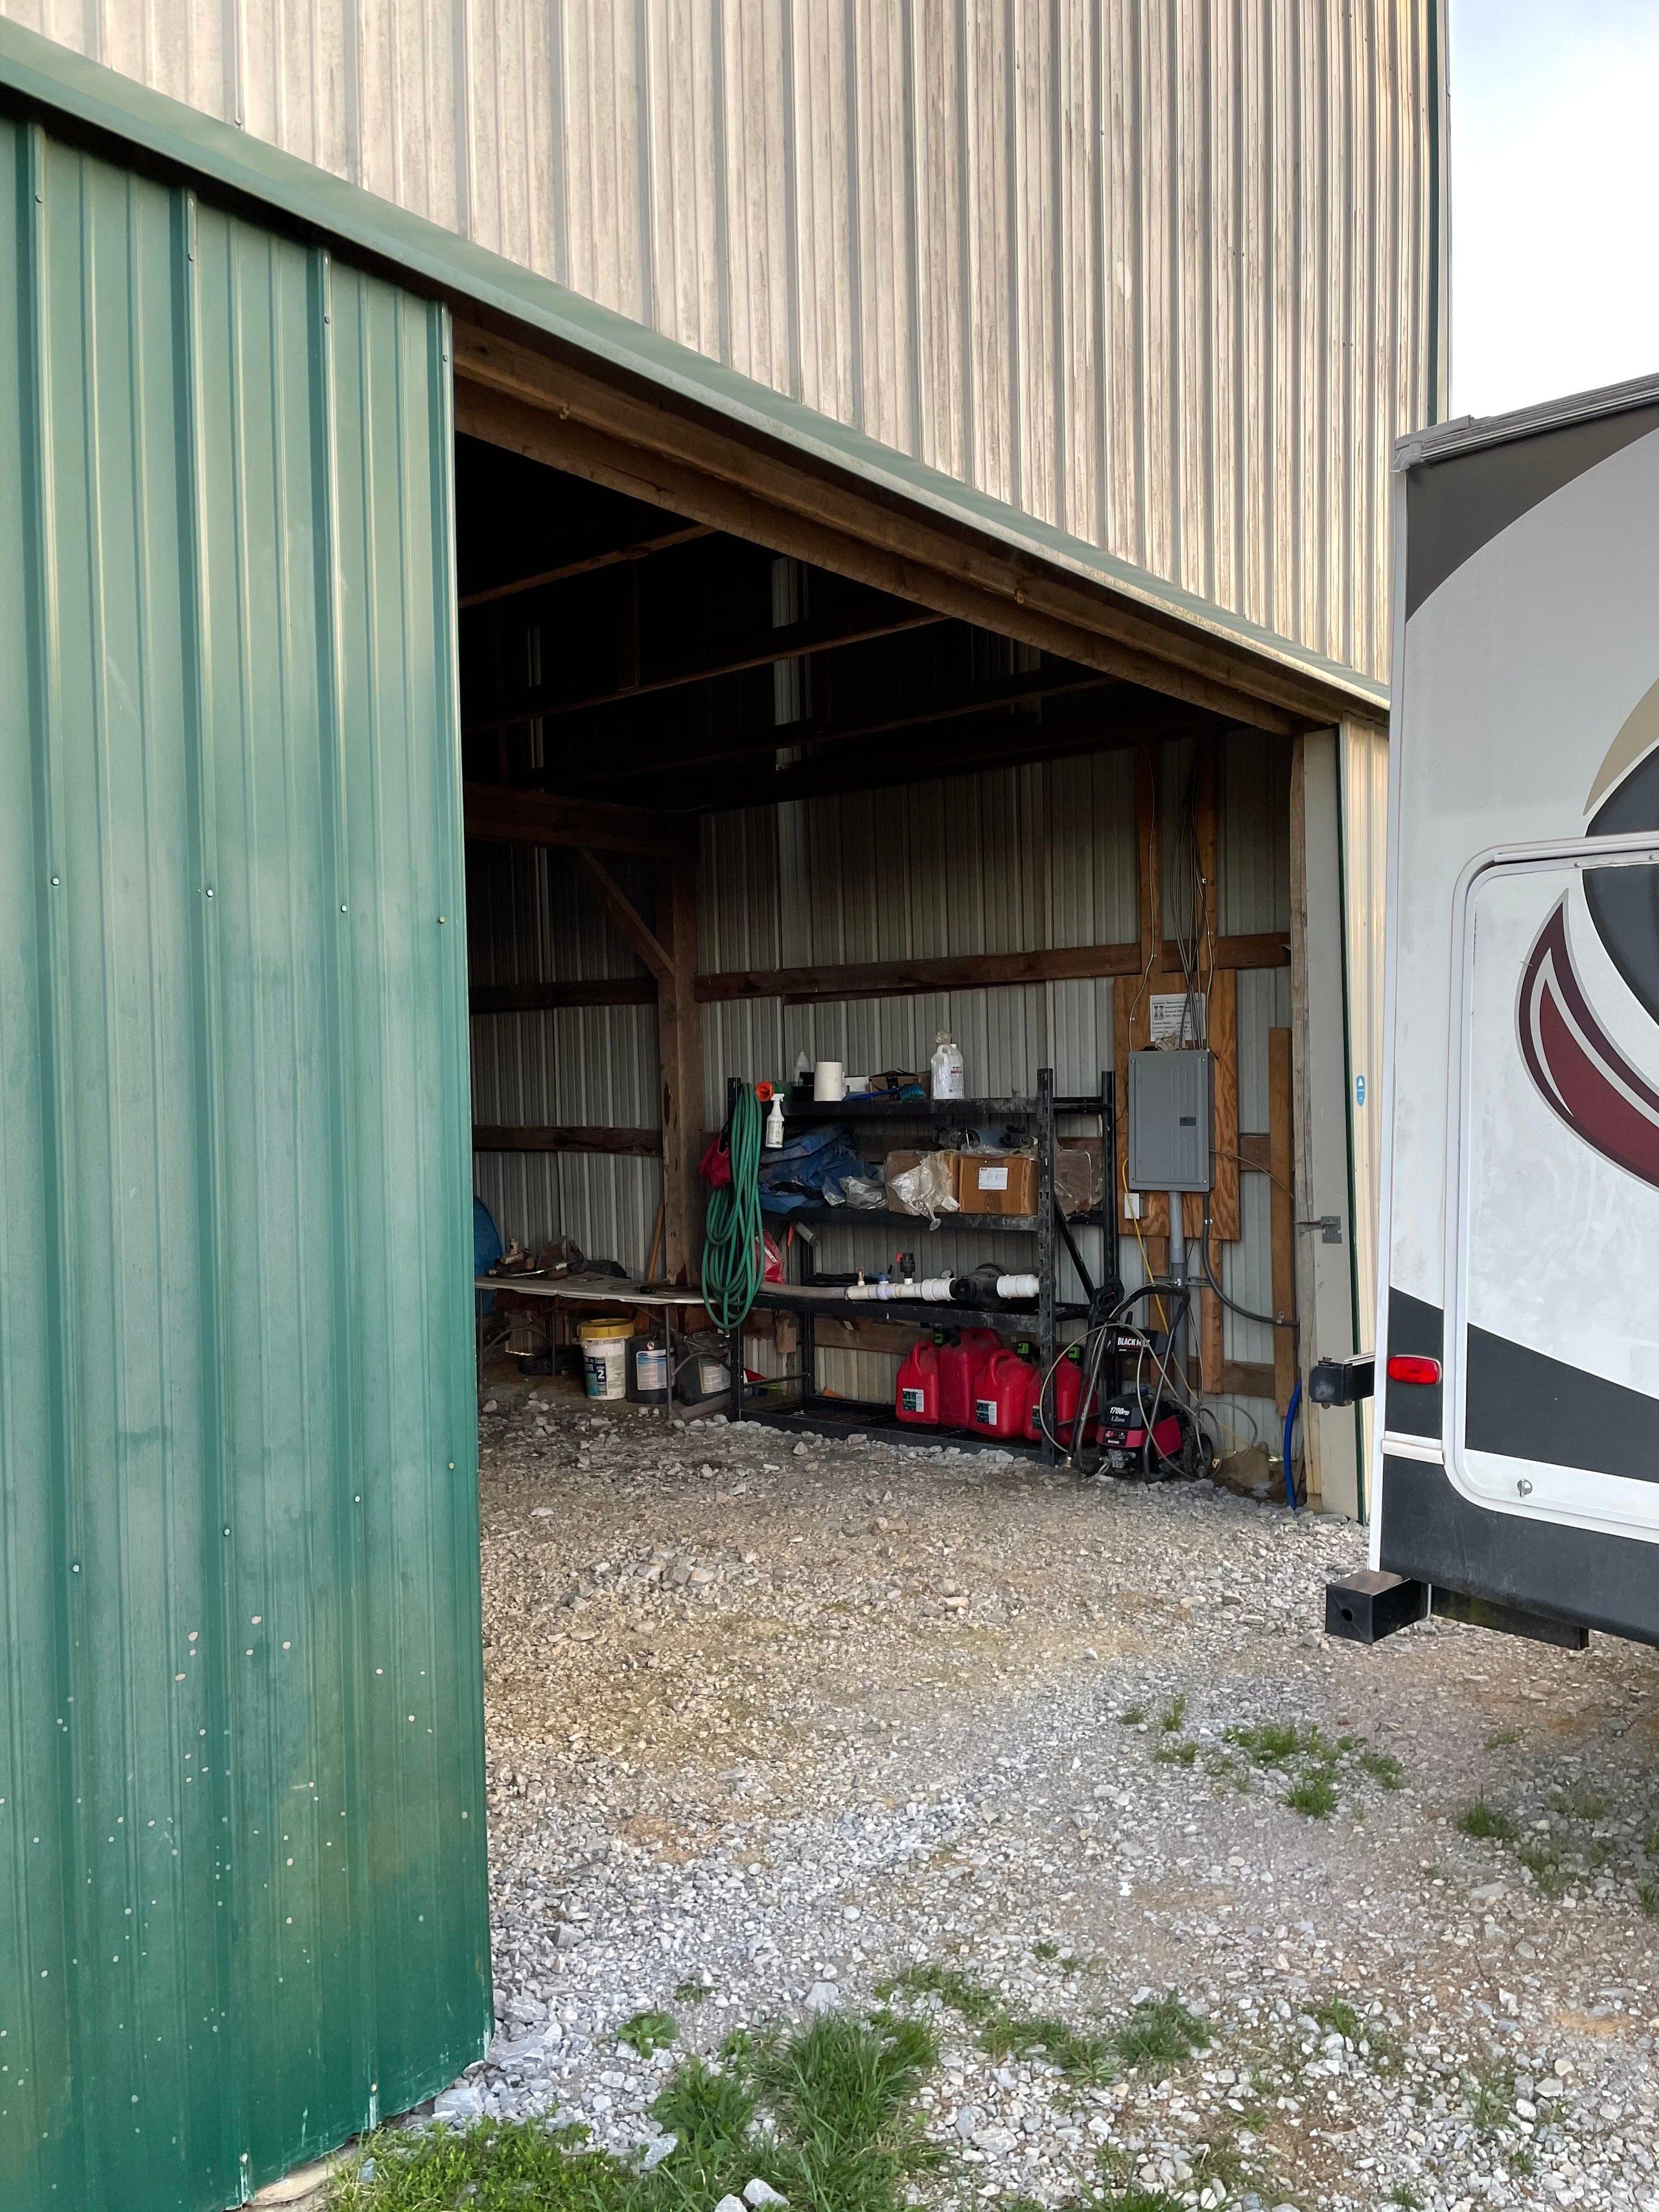 50x25 Parking Lot self storage unit